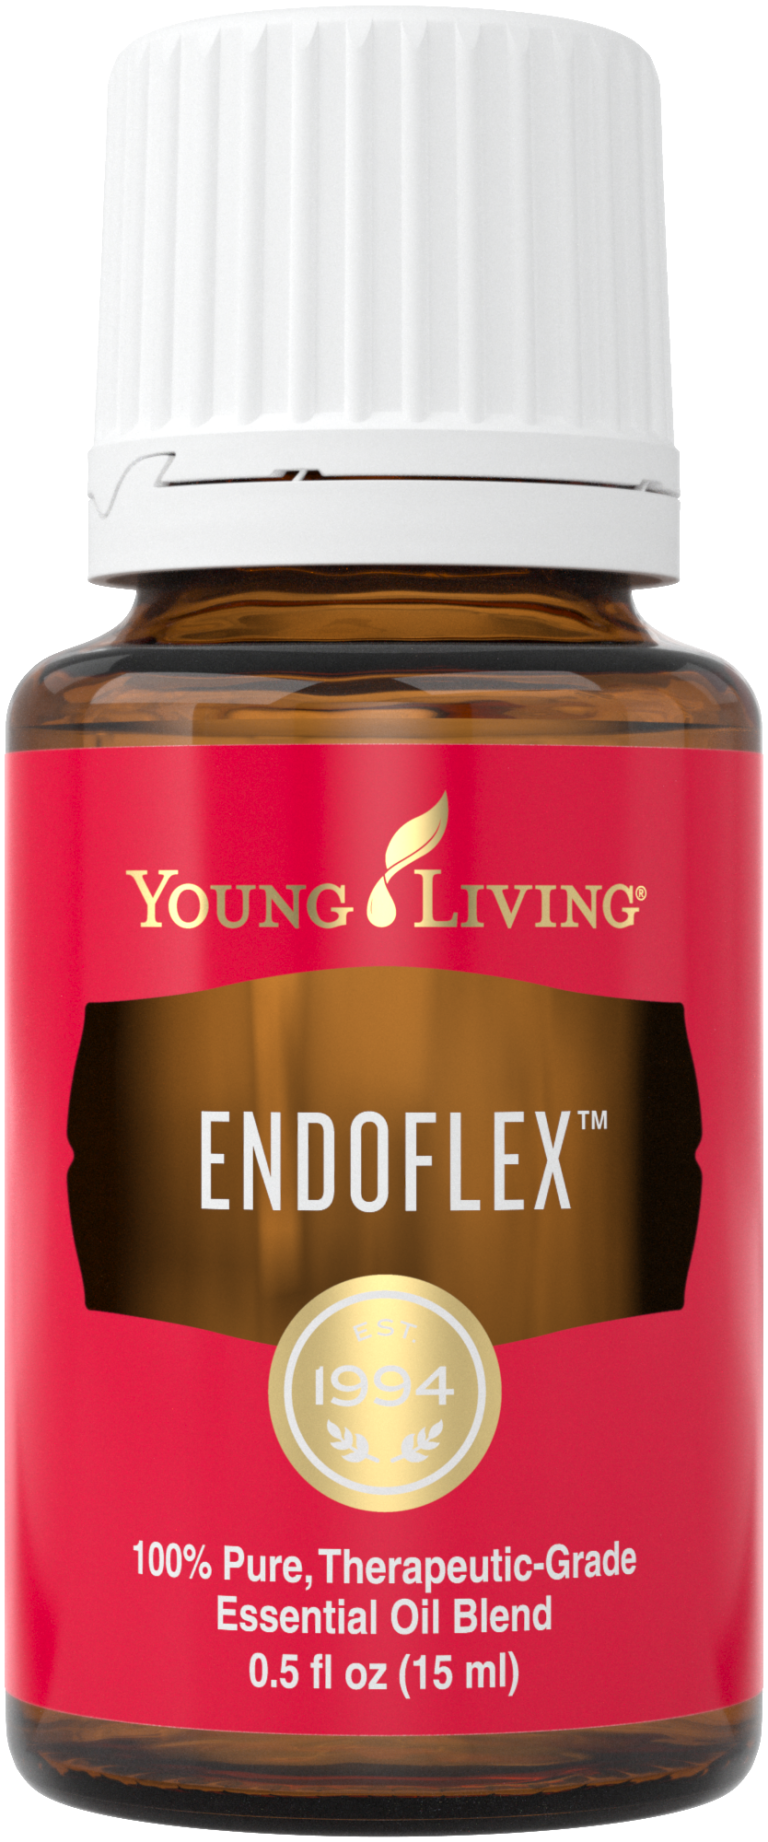 Endoflex